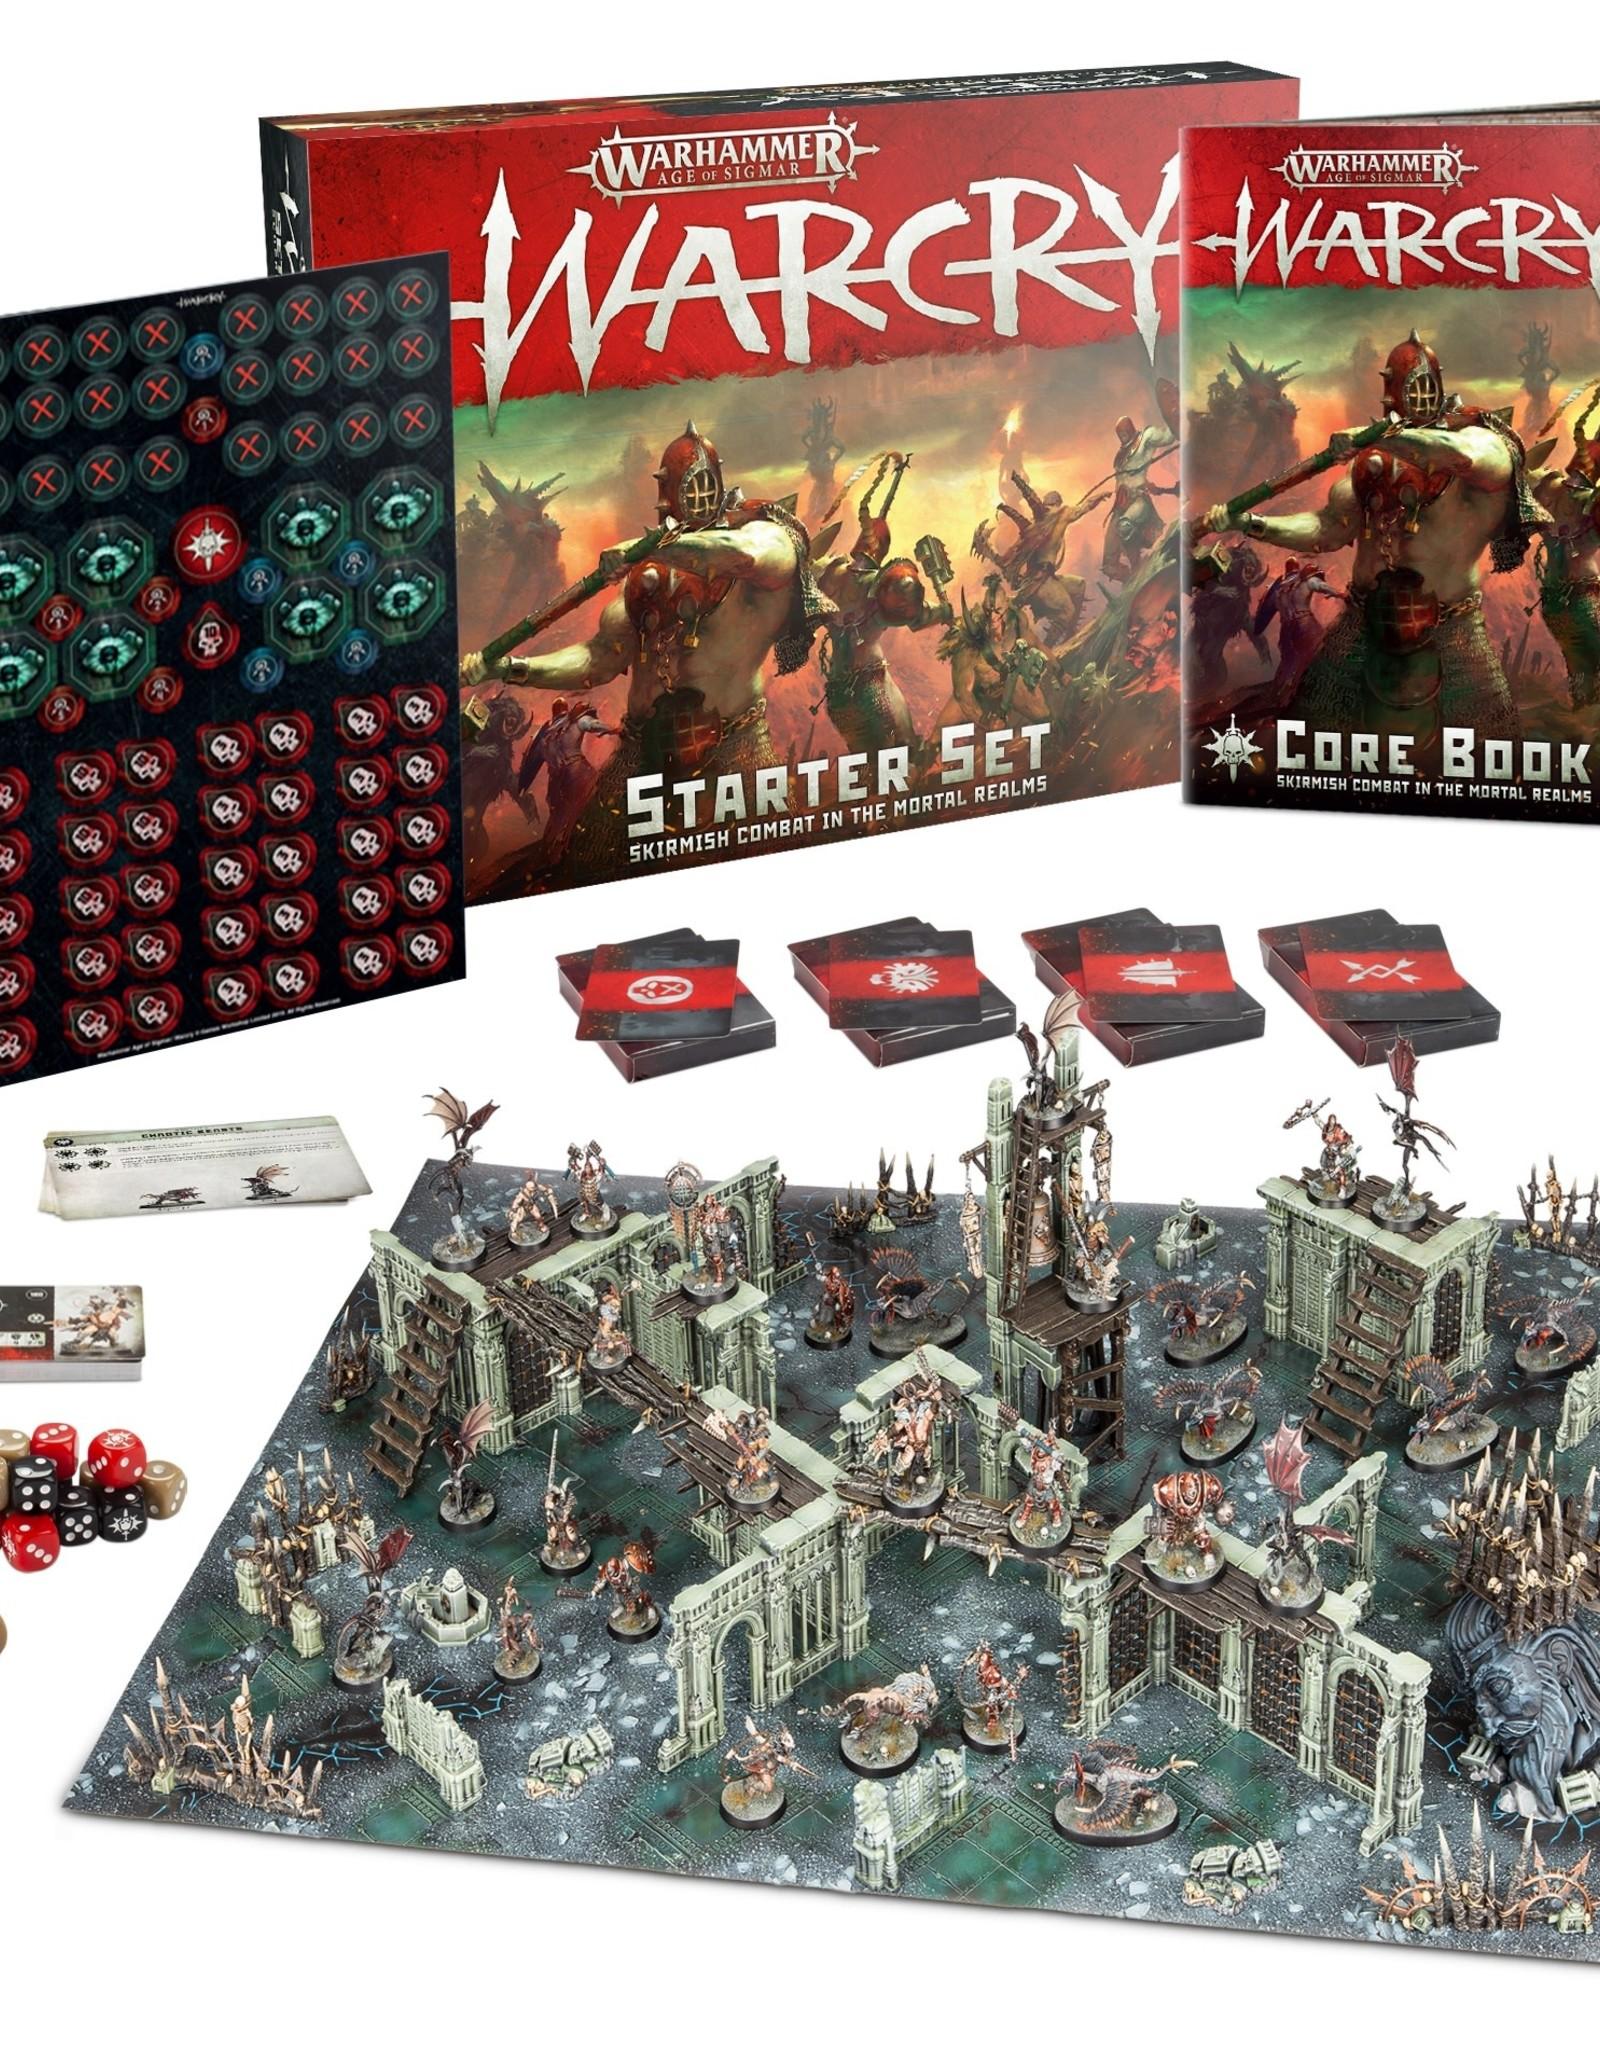 WarCry Warcry Starter Set